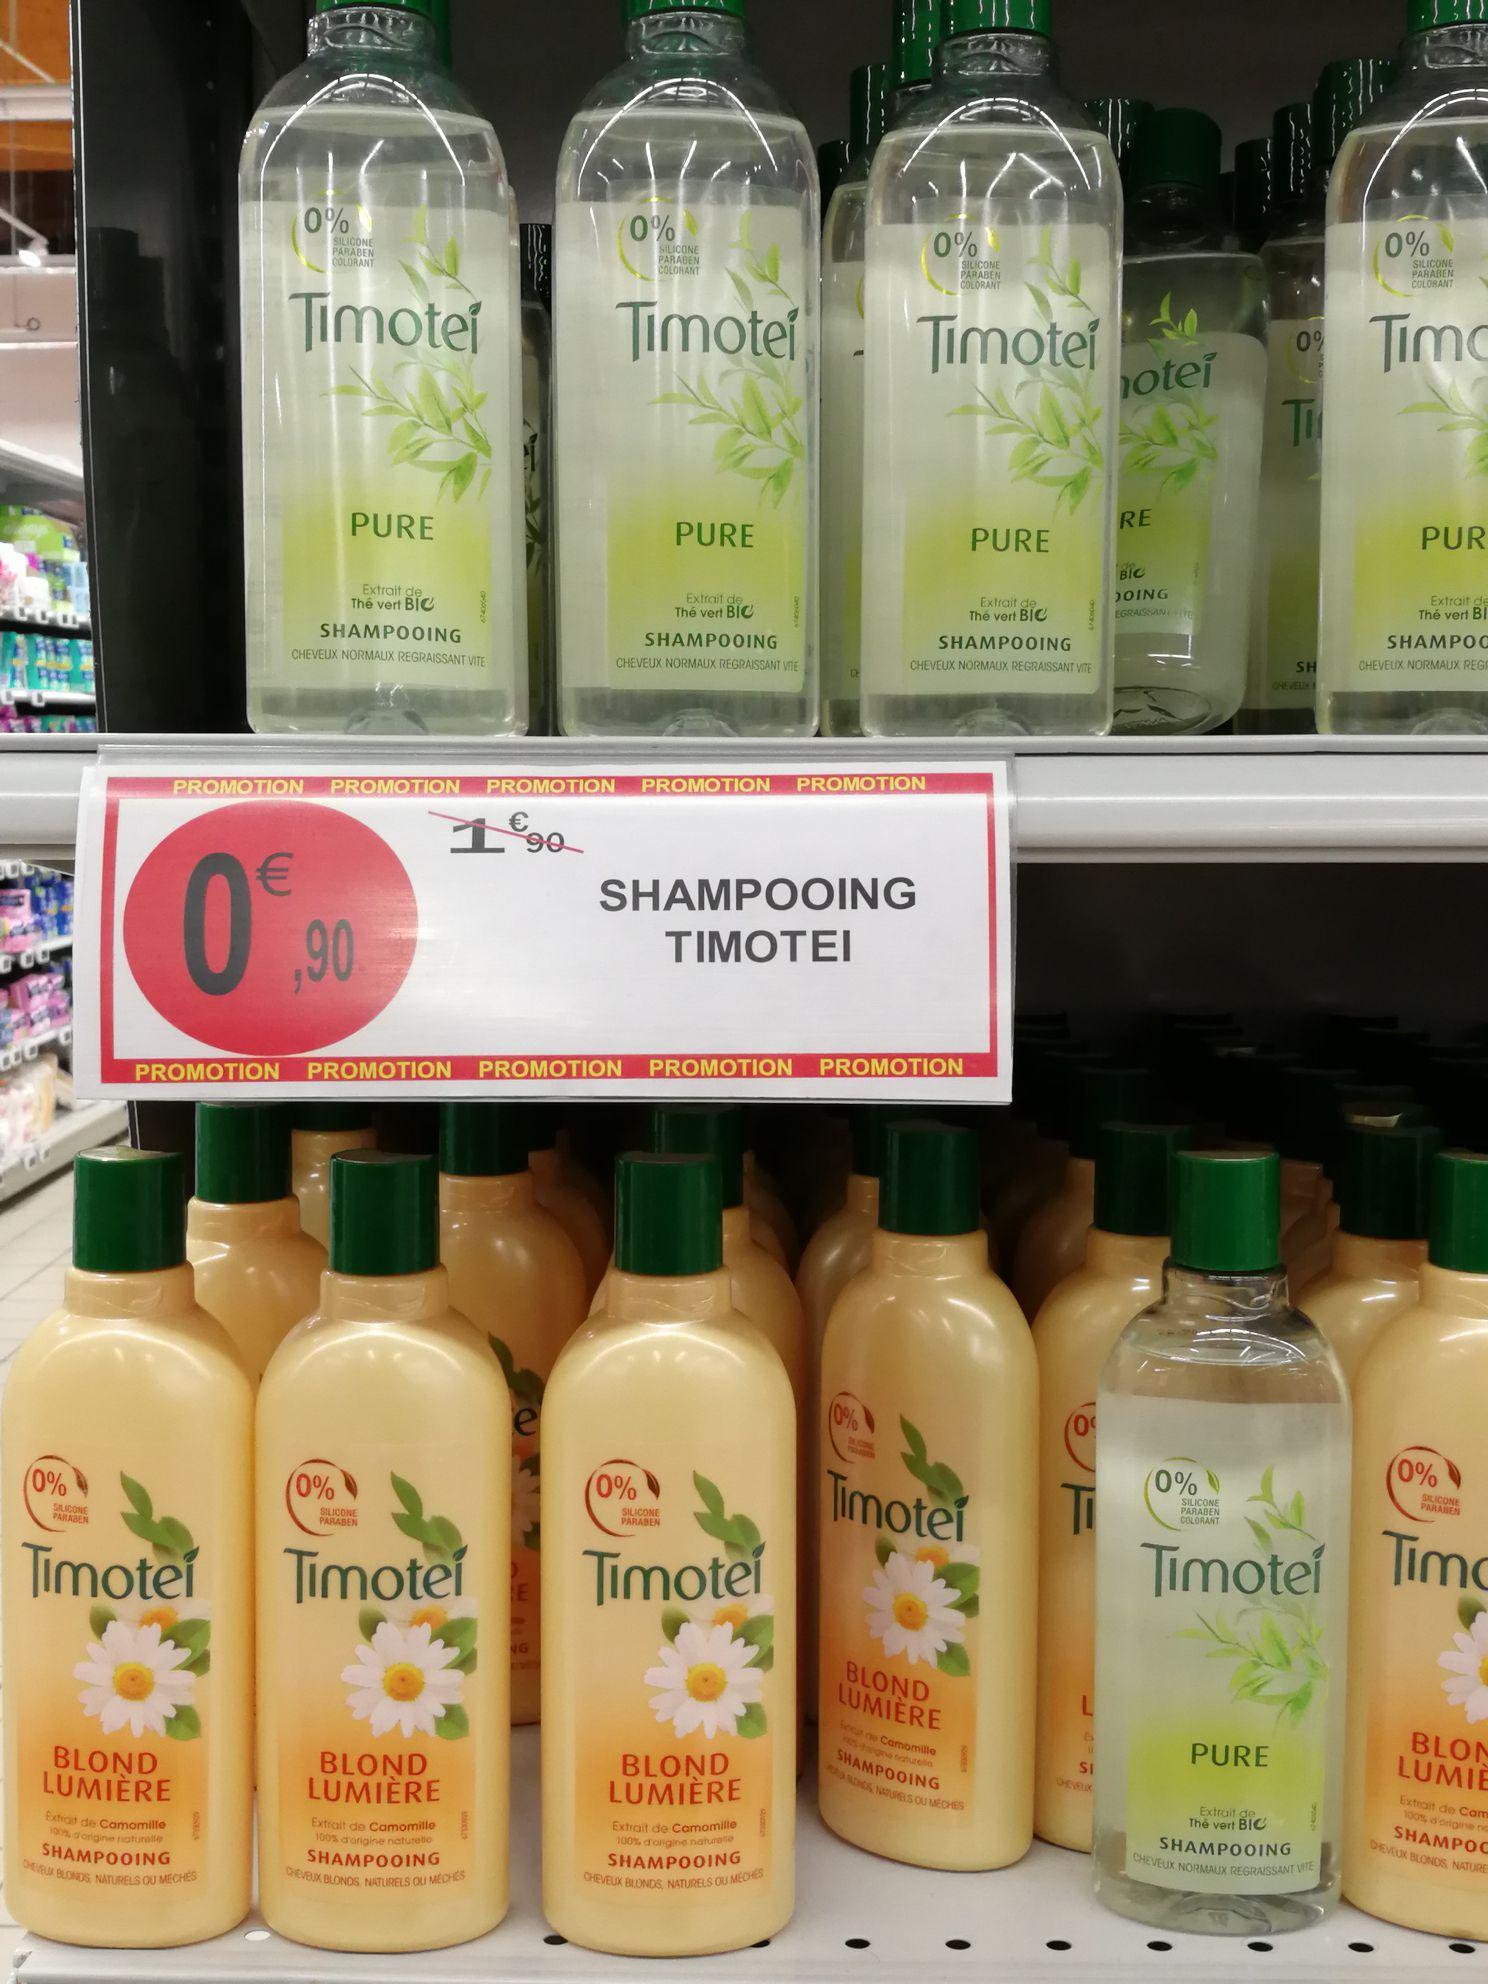 Shampooings Timotei Pure, blond lumière ou nutrition intense (via BDR) - Arles (13)